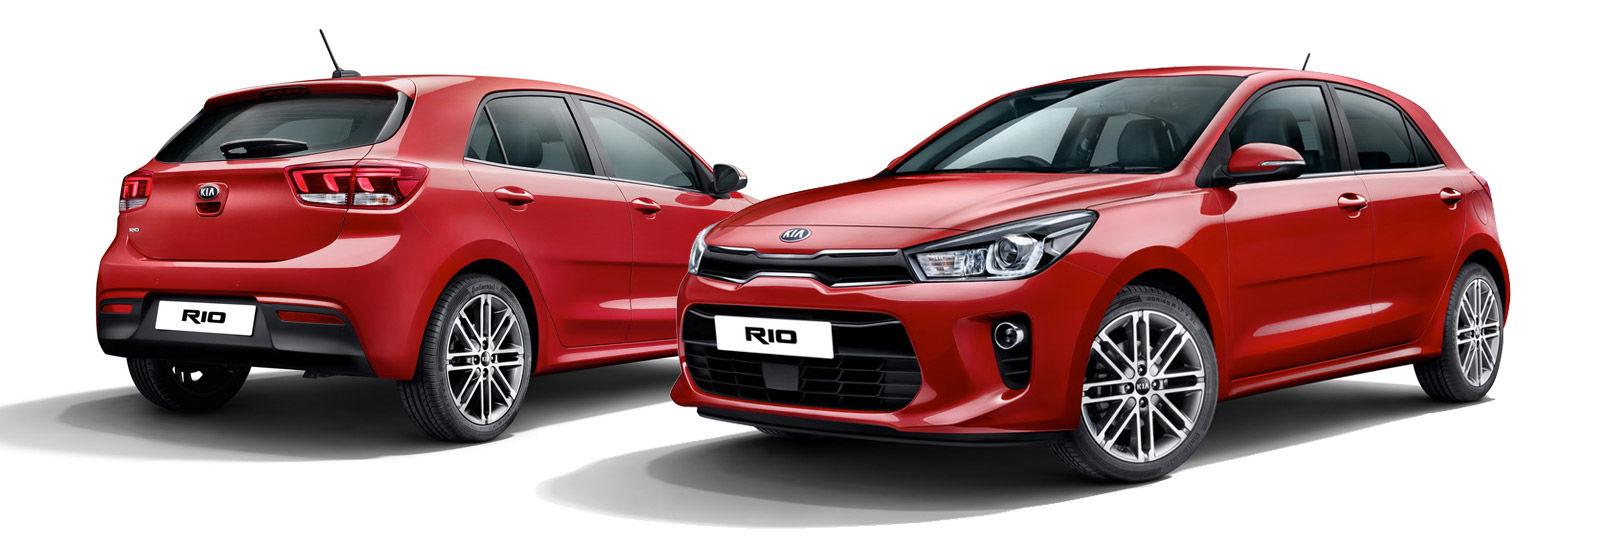 kia new car release2017 Kia Rio price specs and release date  carwow